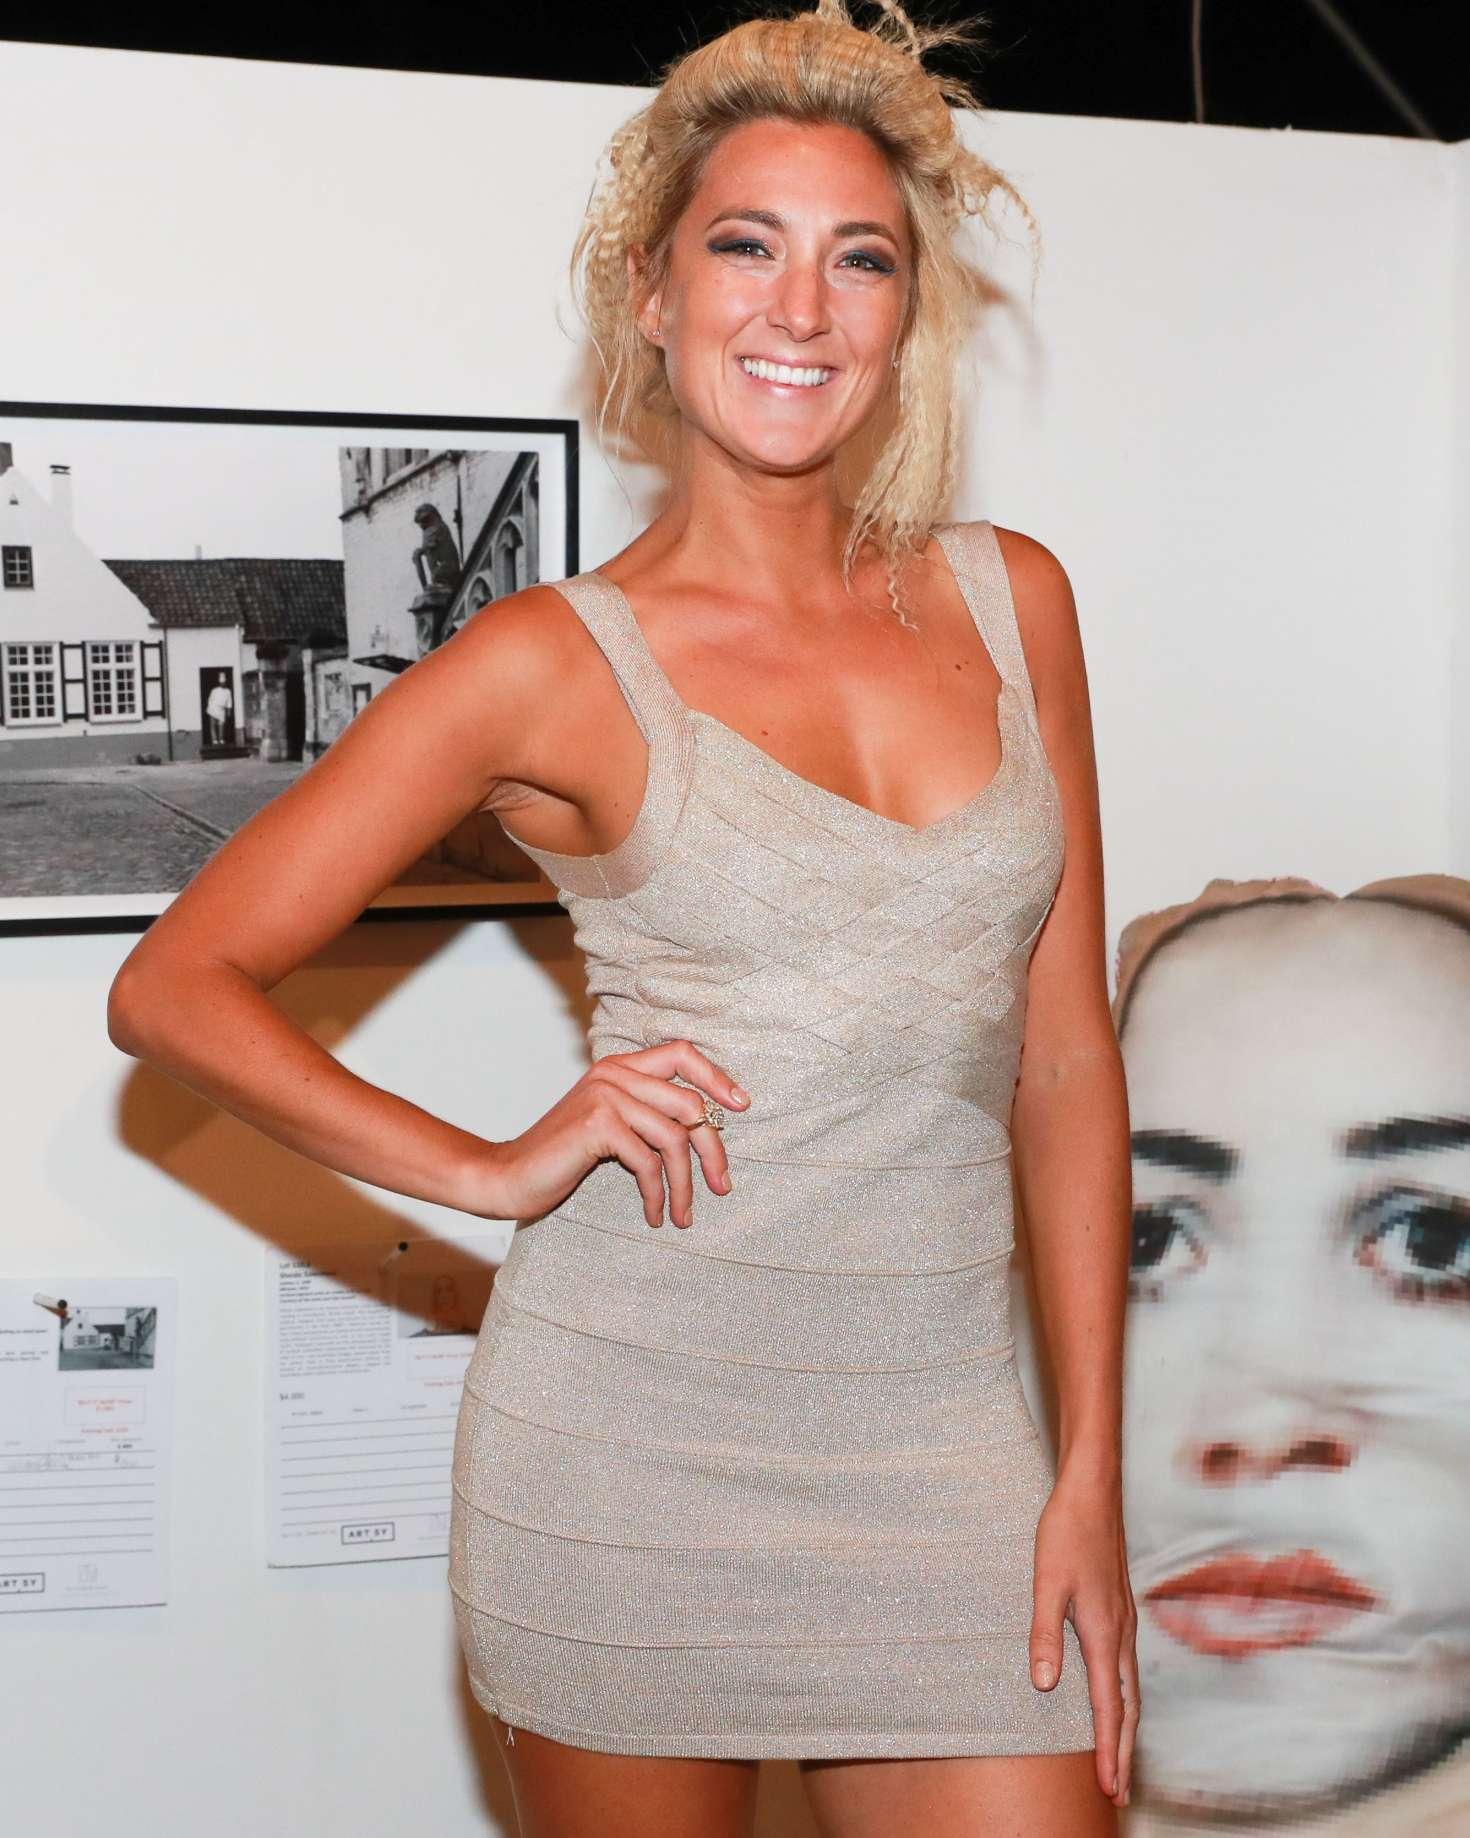 Liana Werner-Gray naked 723